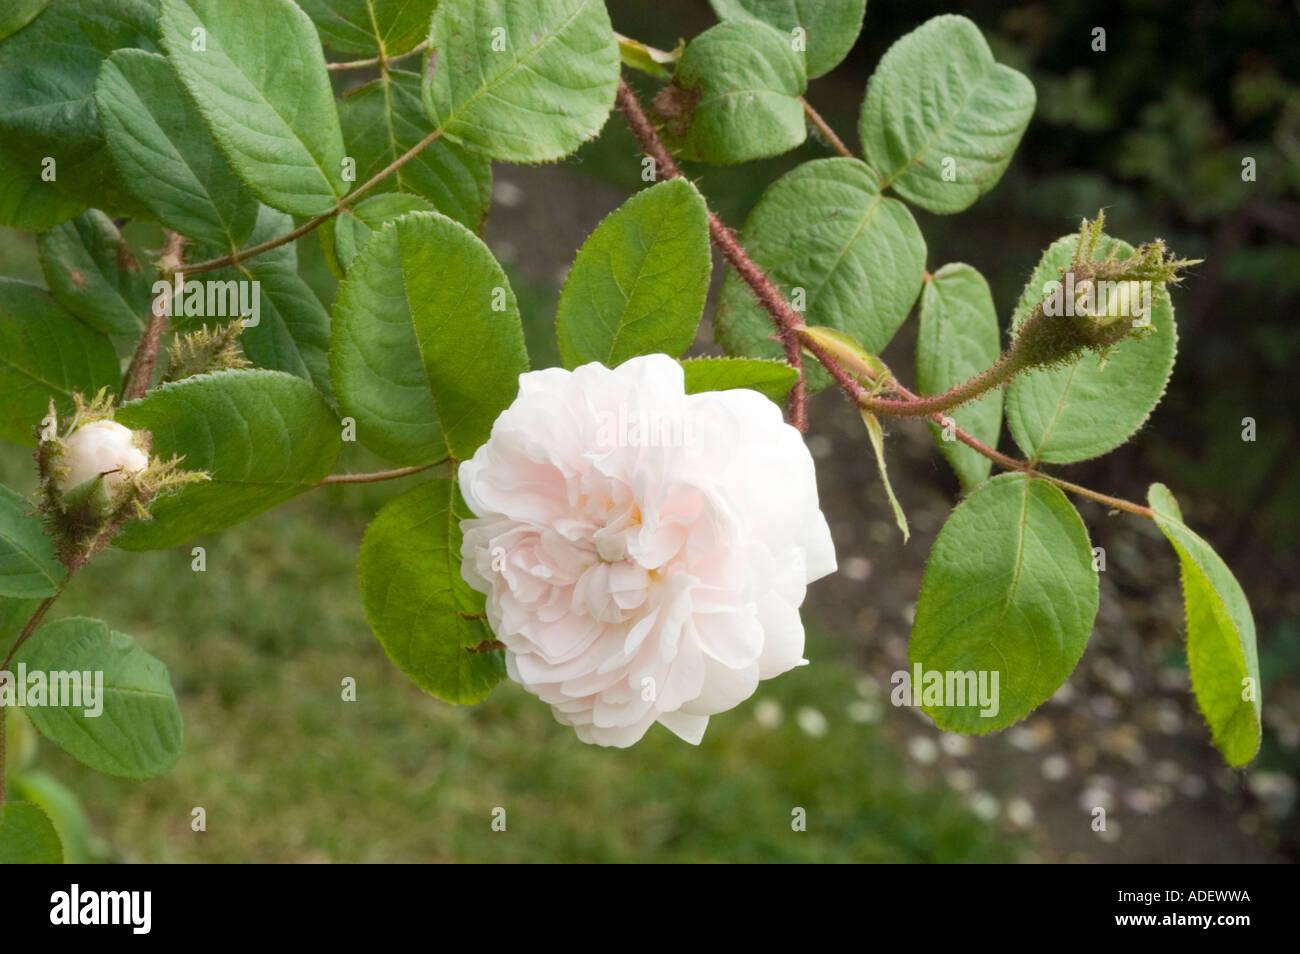 Rose Rosaceae Rosa x bifera remontanty Frau Karl Druschki o Snow Queen o bianco American Beauty o Reine des Neiges Foto Stock